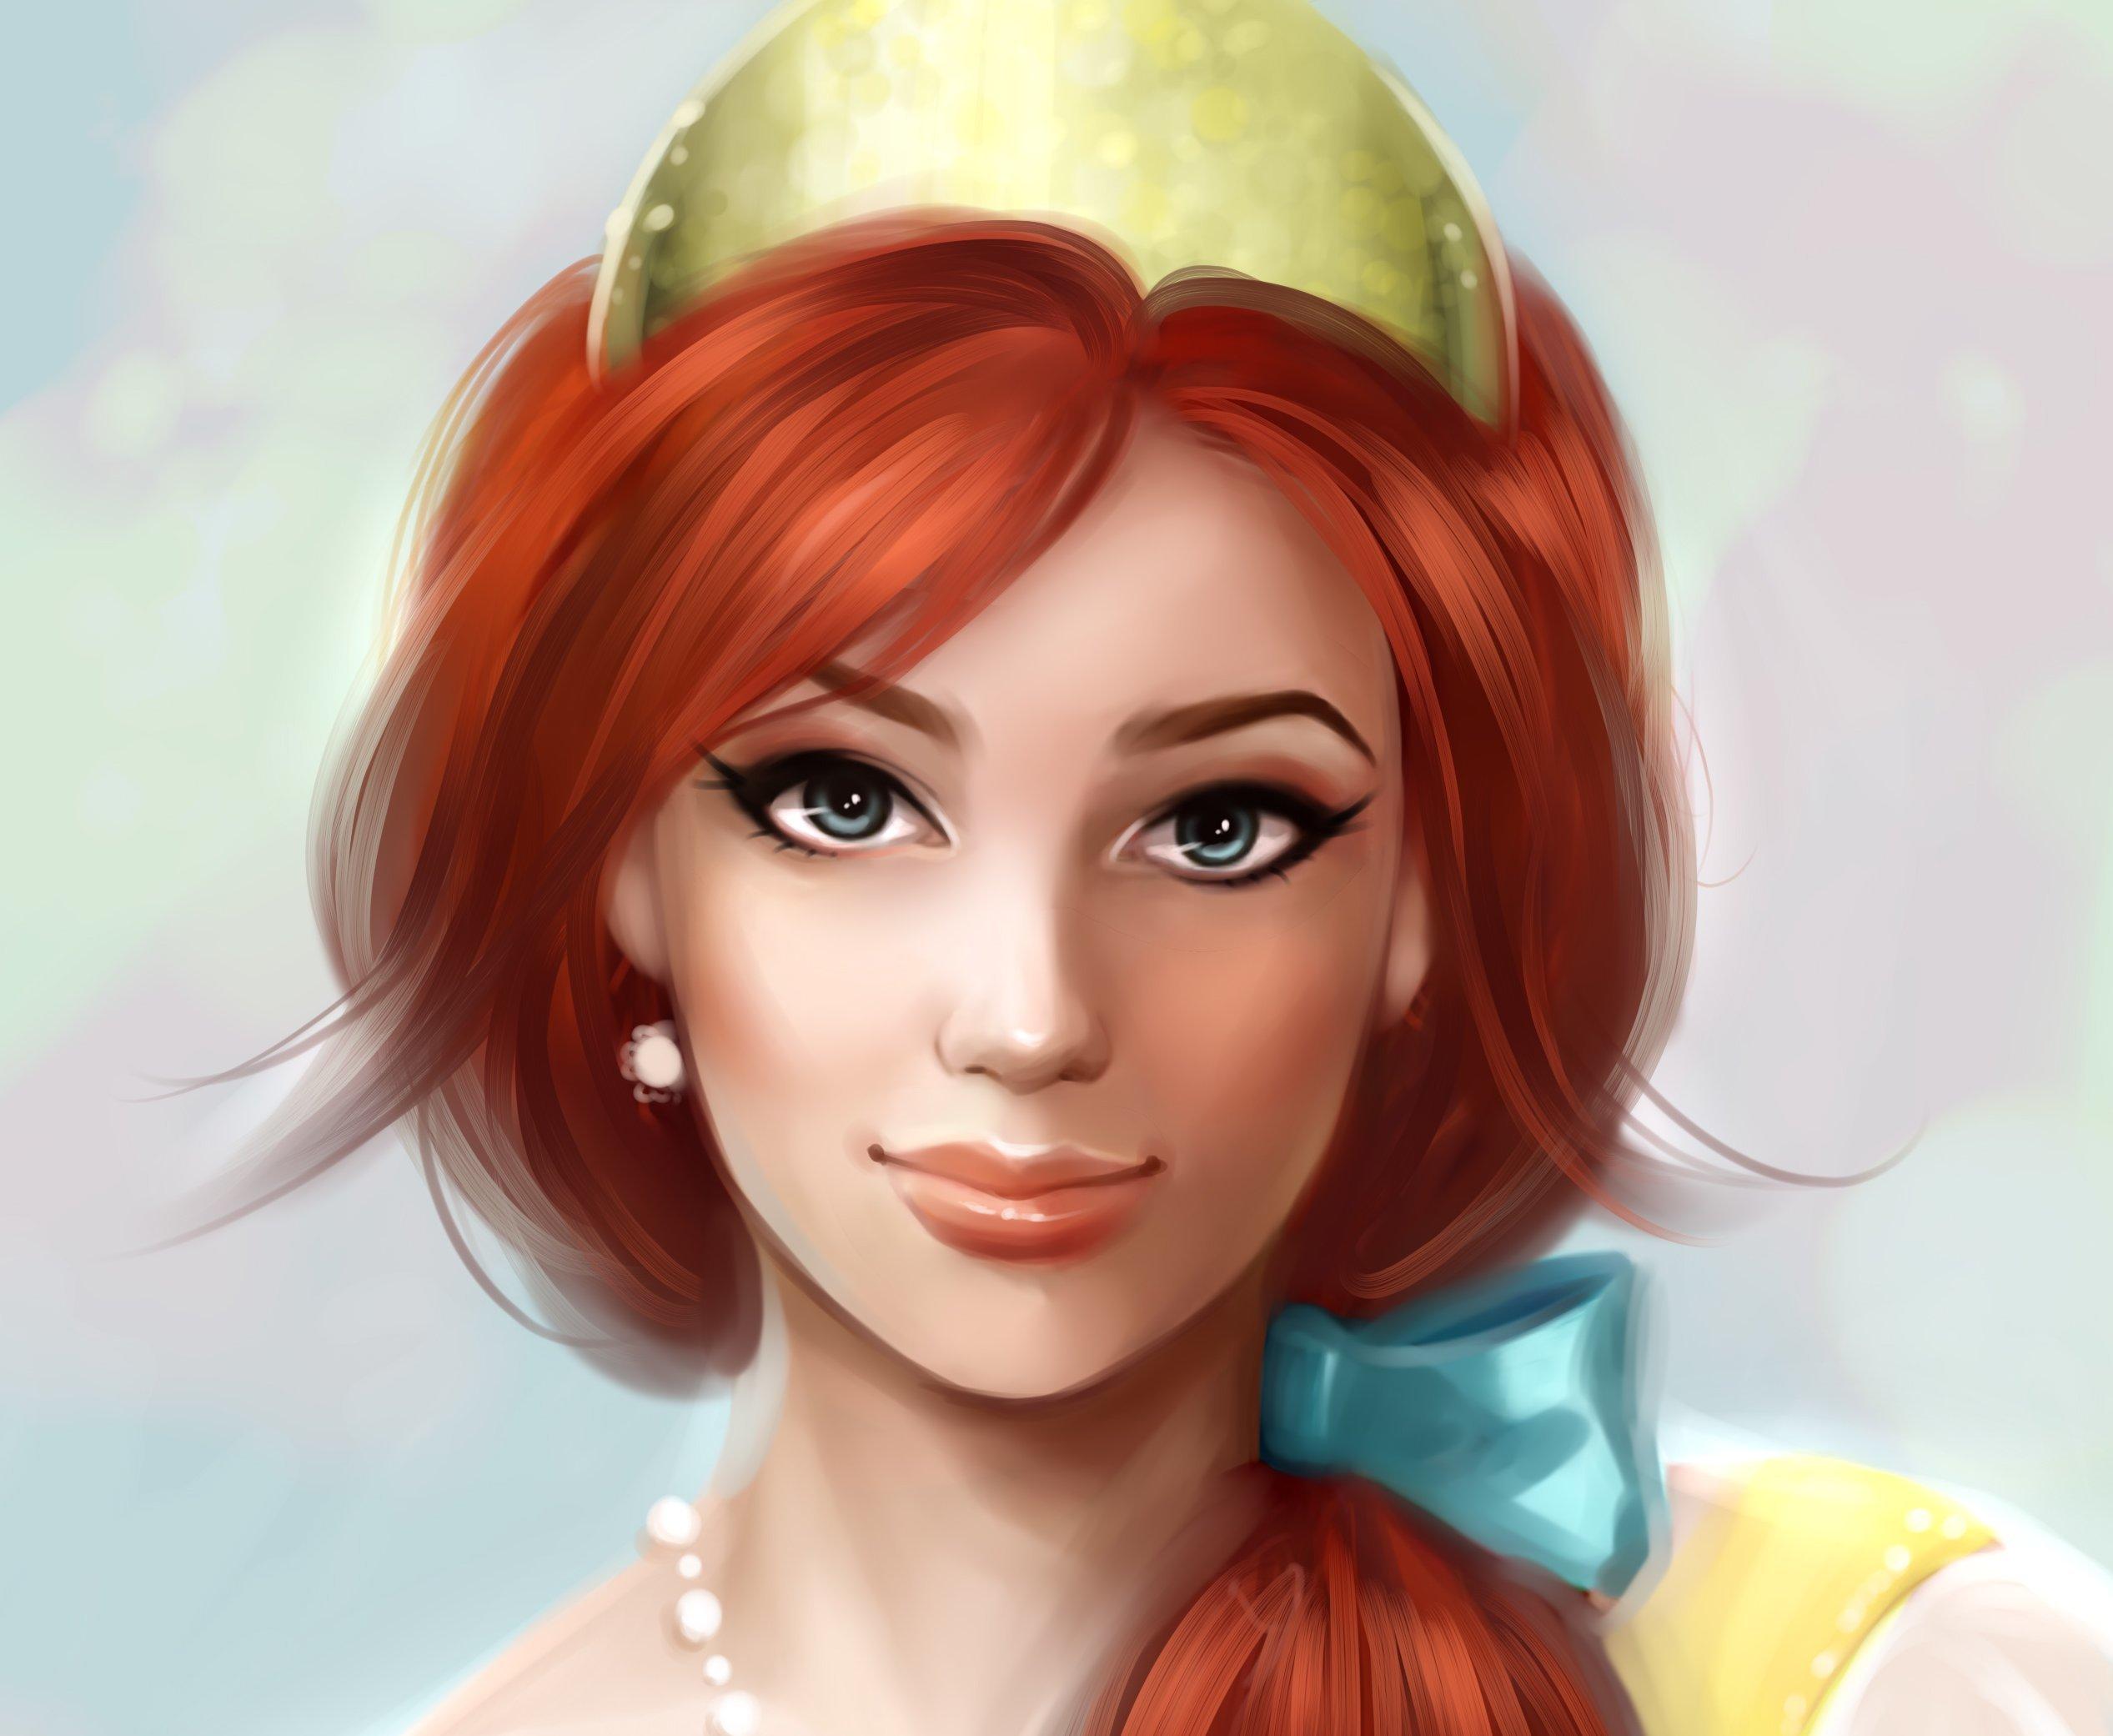 earrings girl hair makeup - photo #13